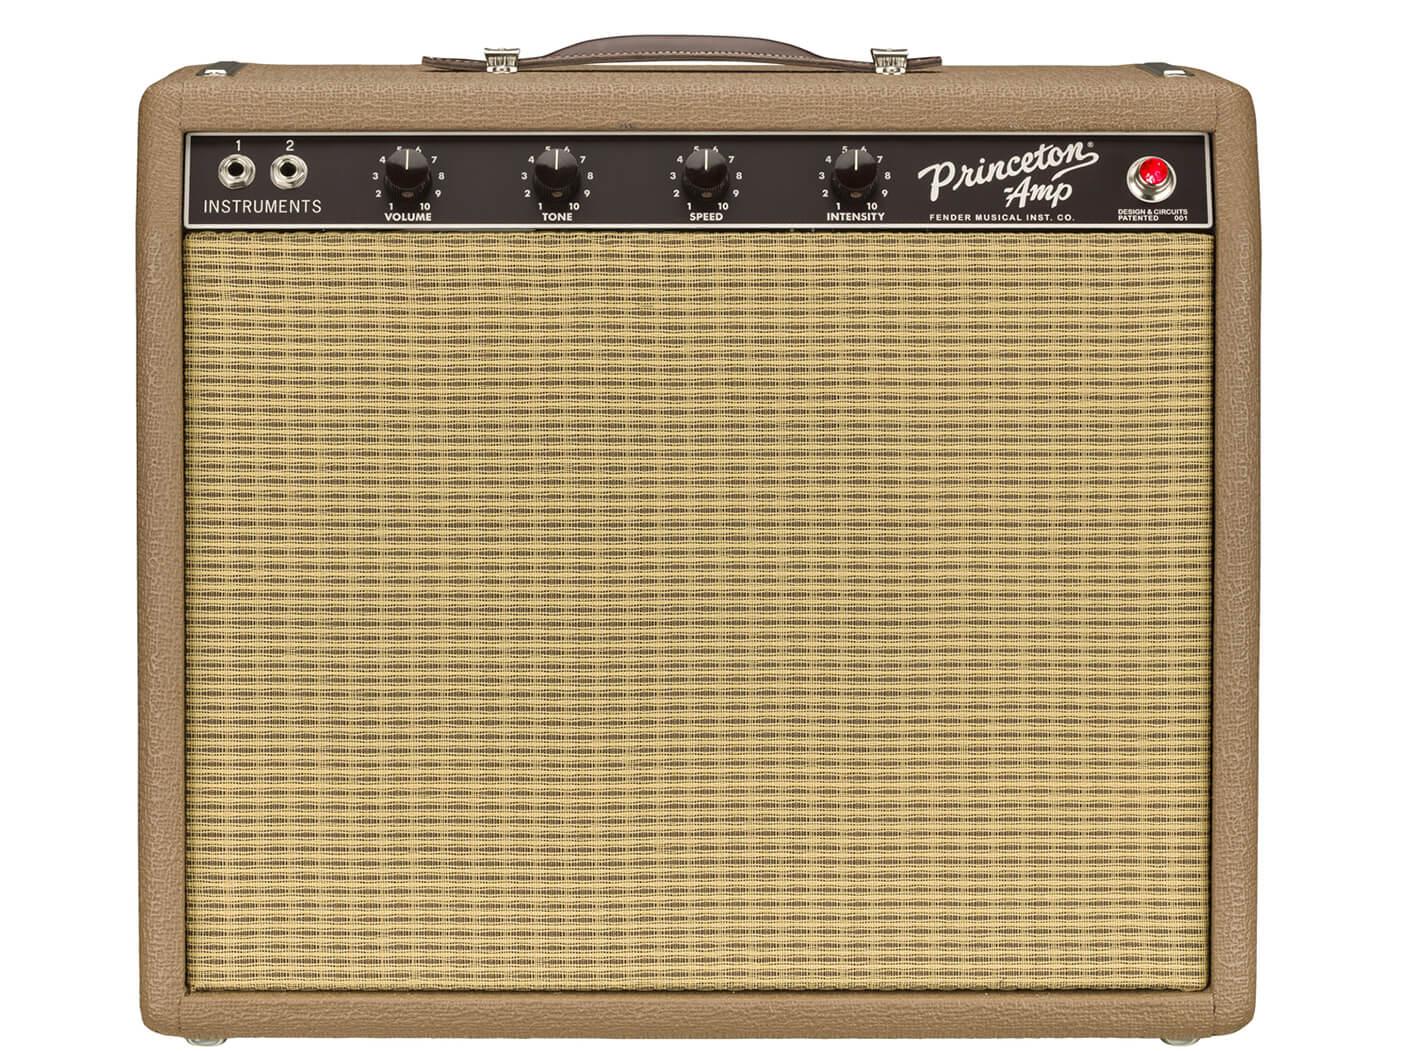 Fender '62 Princeton Chris Stapleton Signature Amp